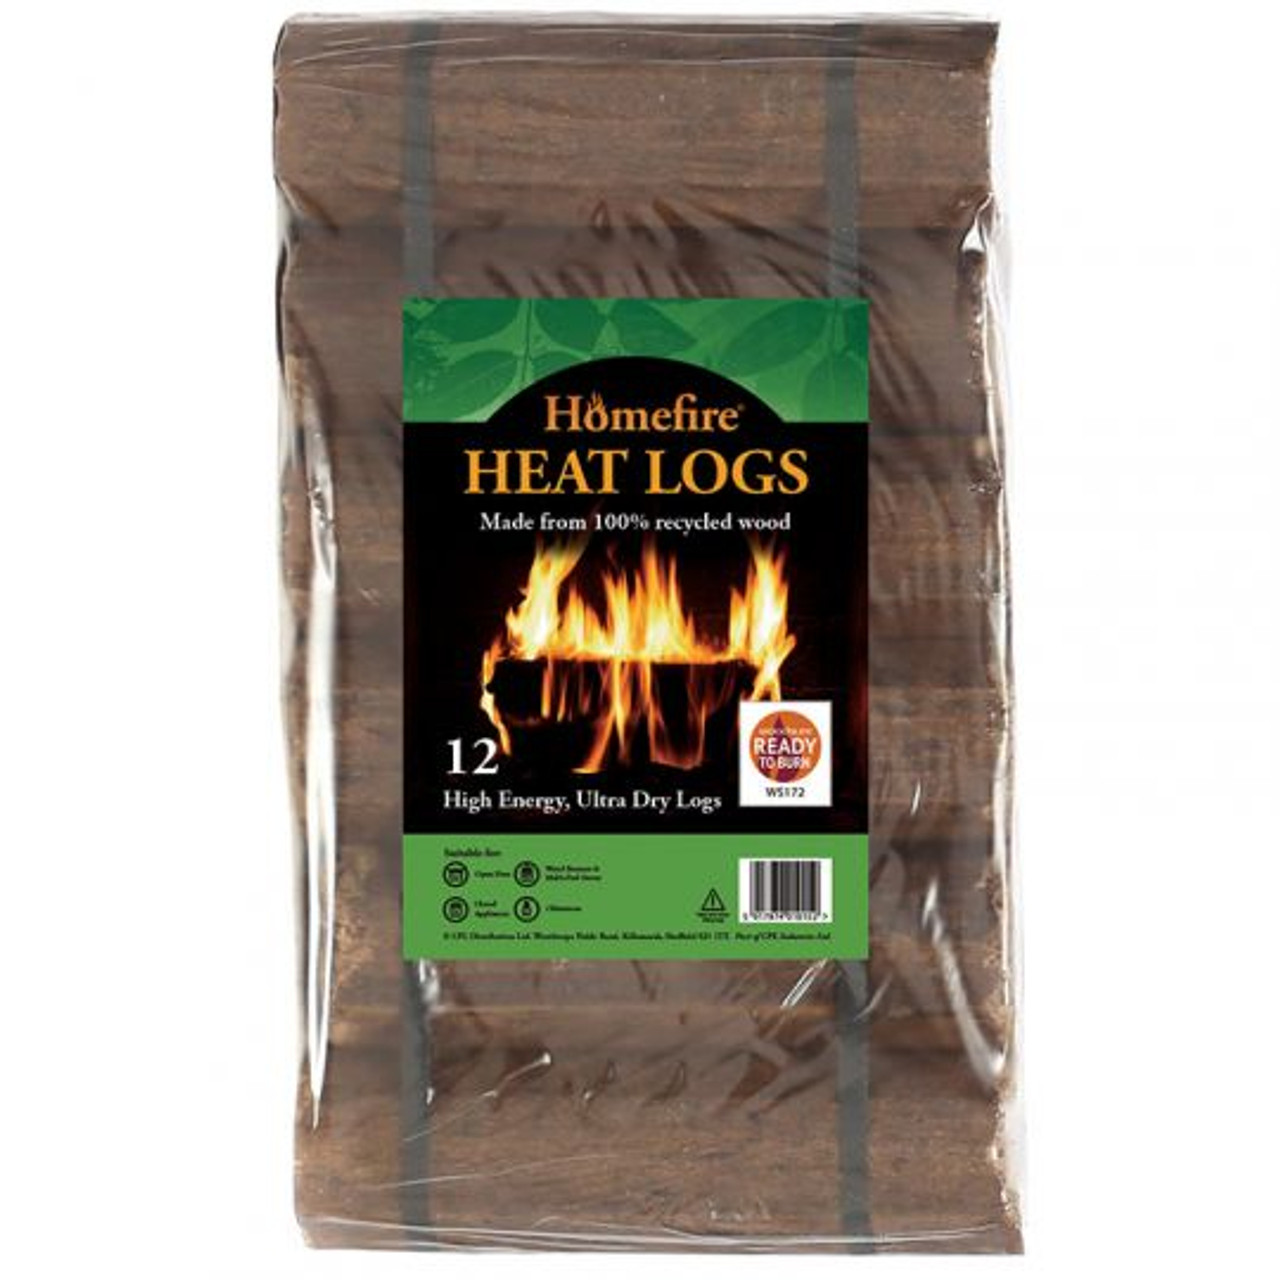 Homefire Shimada Heat Logs (12pk)